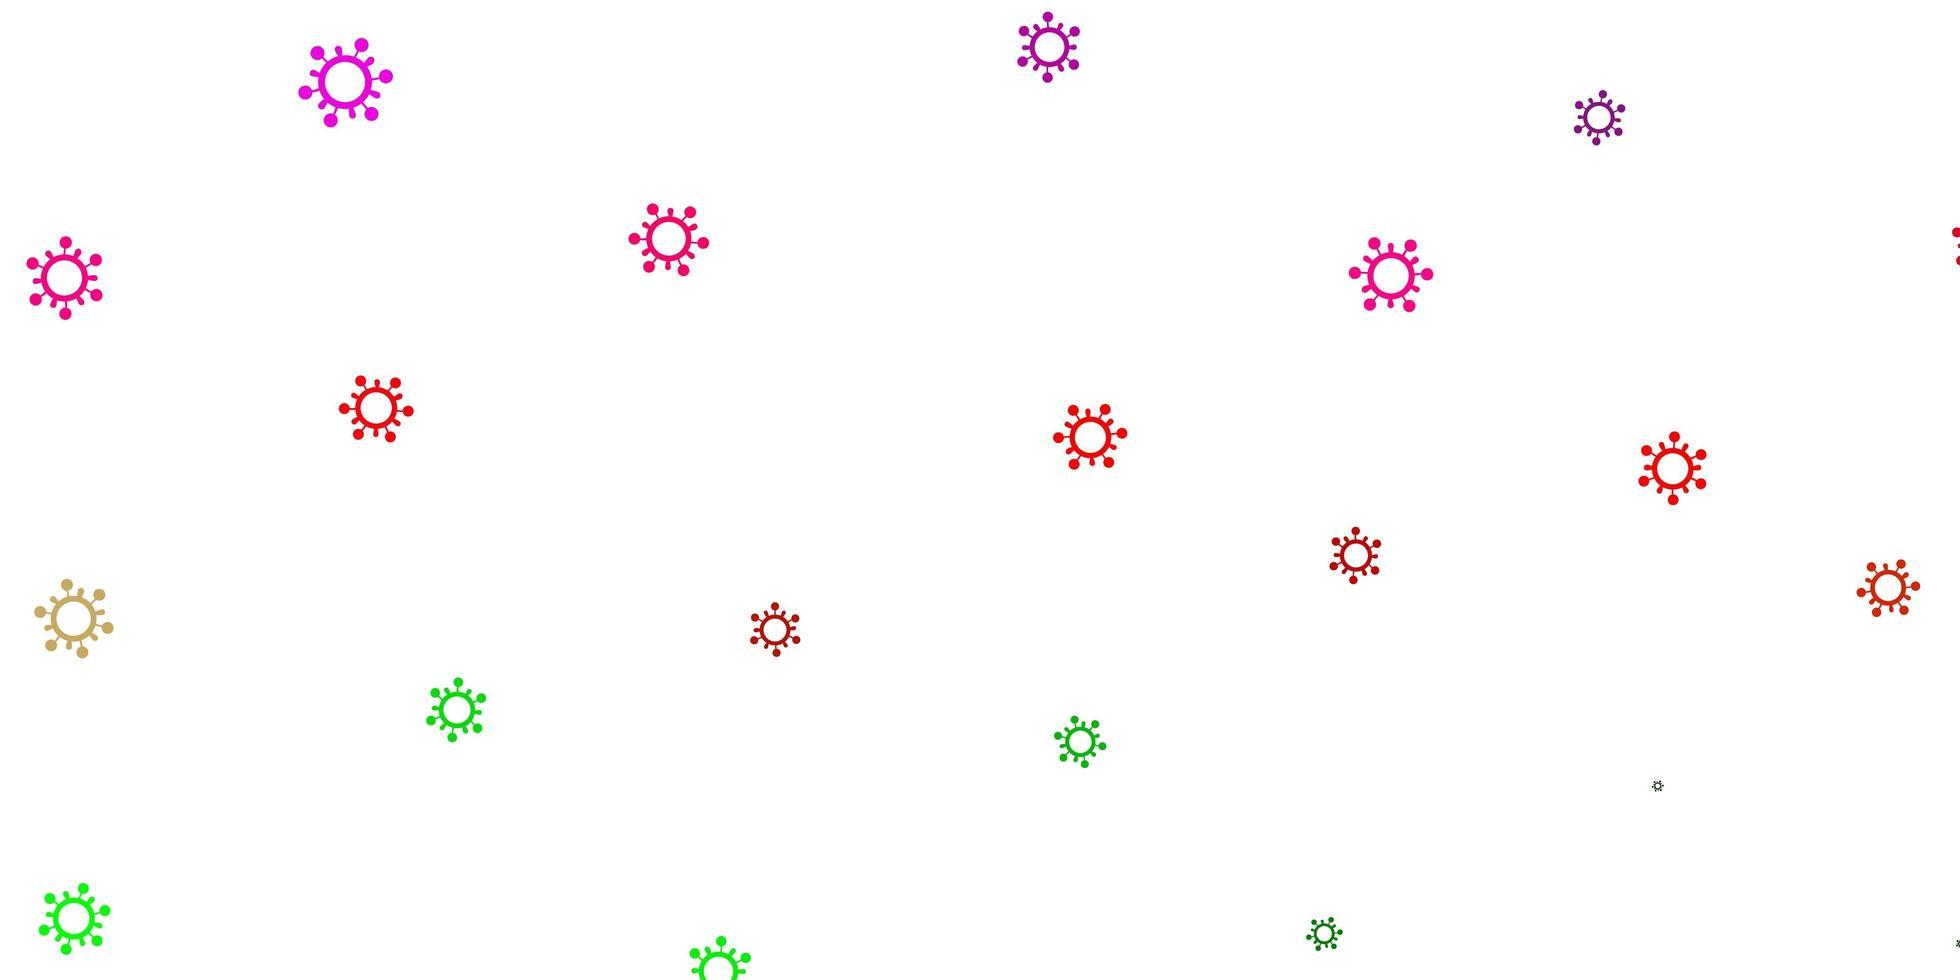 de fundo vector rosa claro, verde com símbolos covid-19.